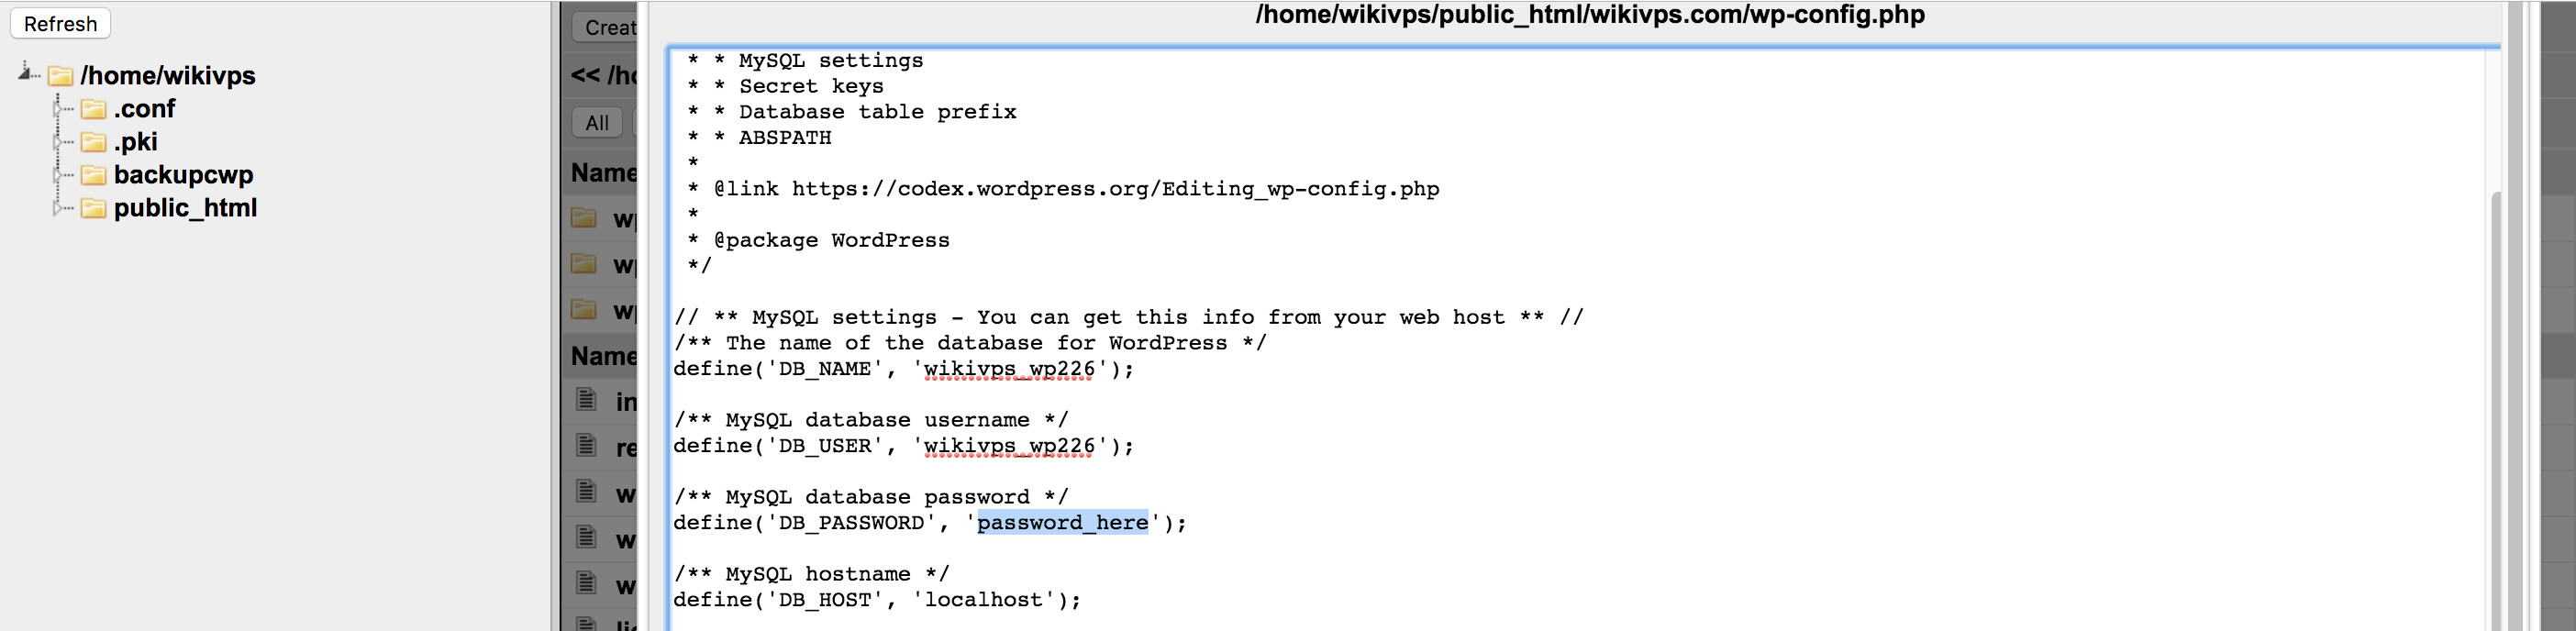 wikivps- check file cấu hình database